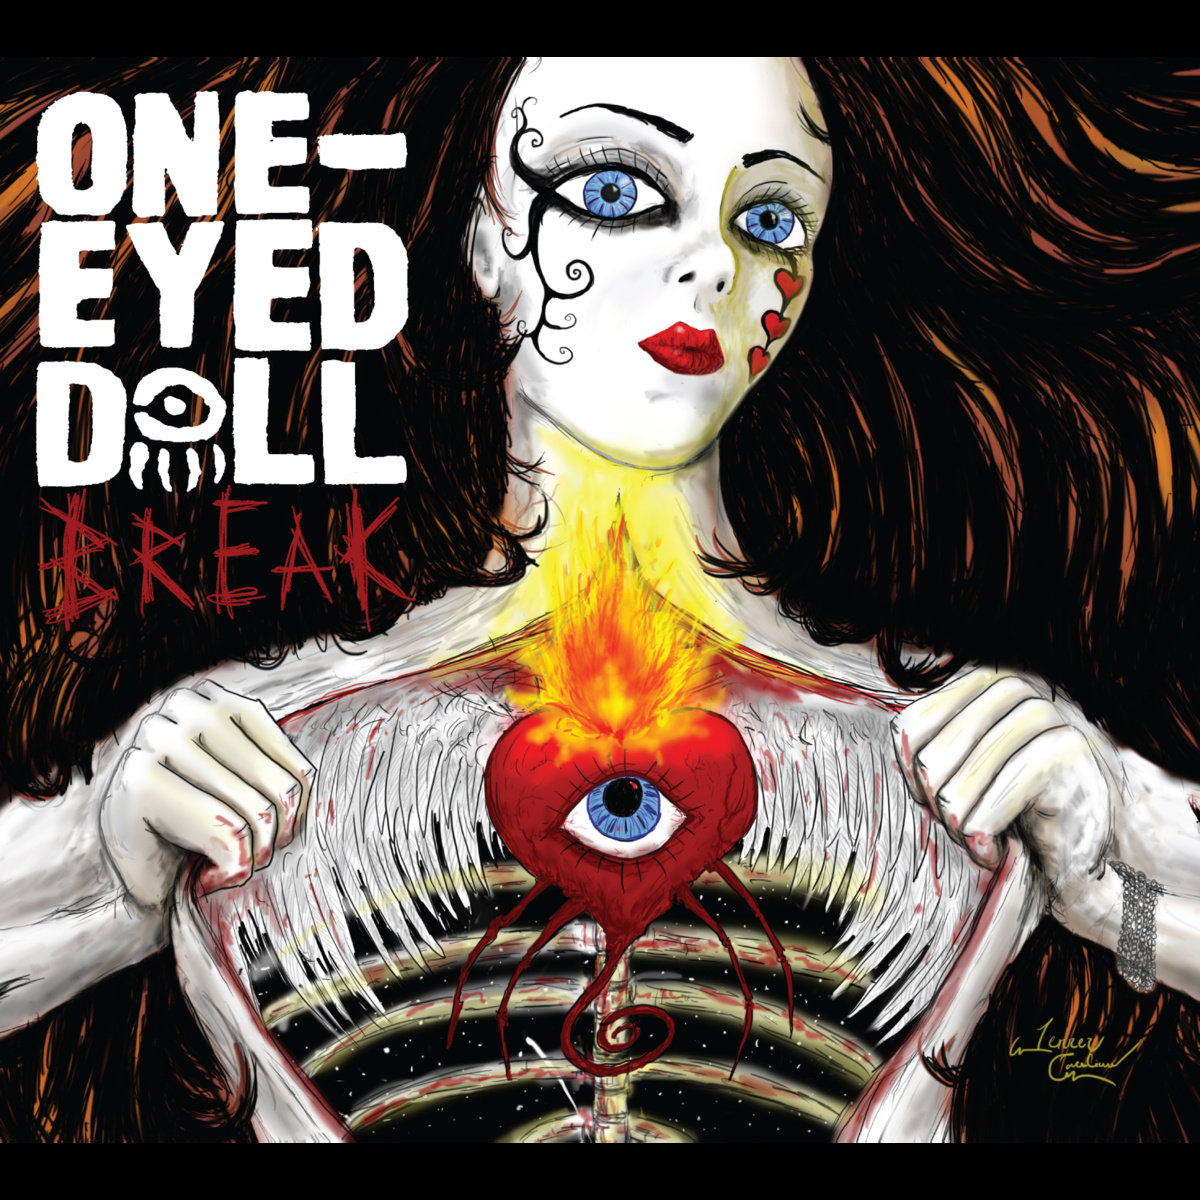 See Jane Run One Eyed Doll